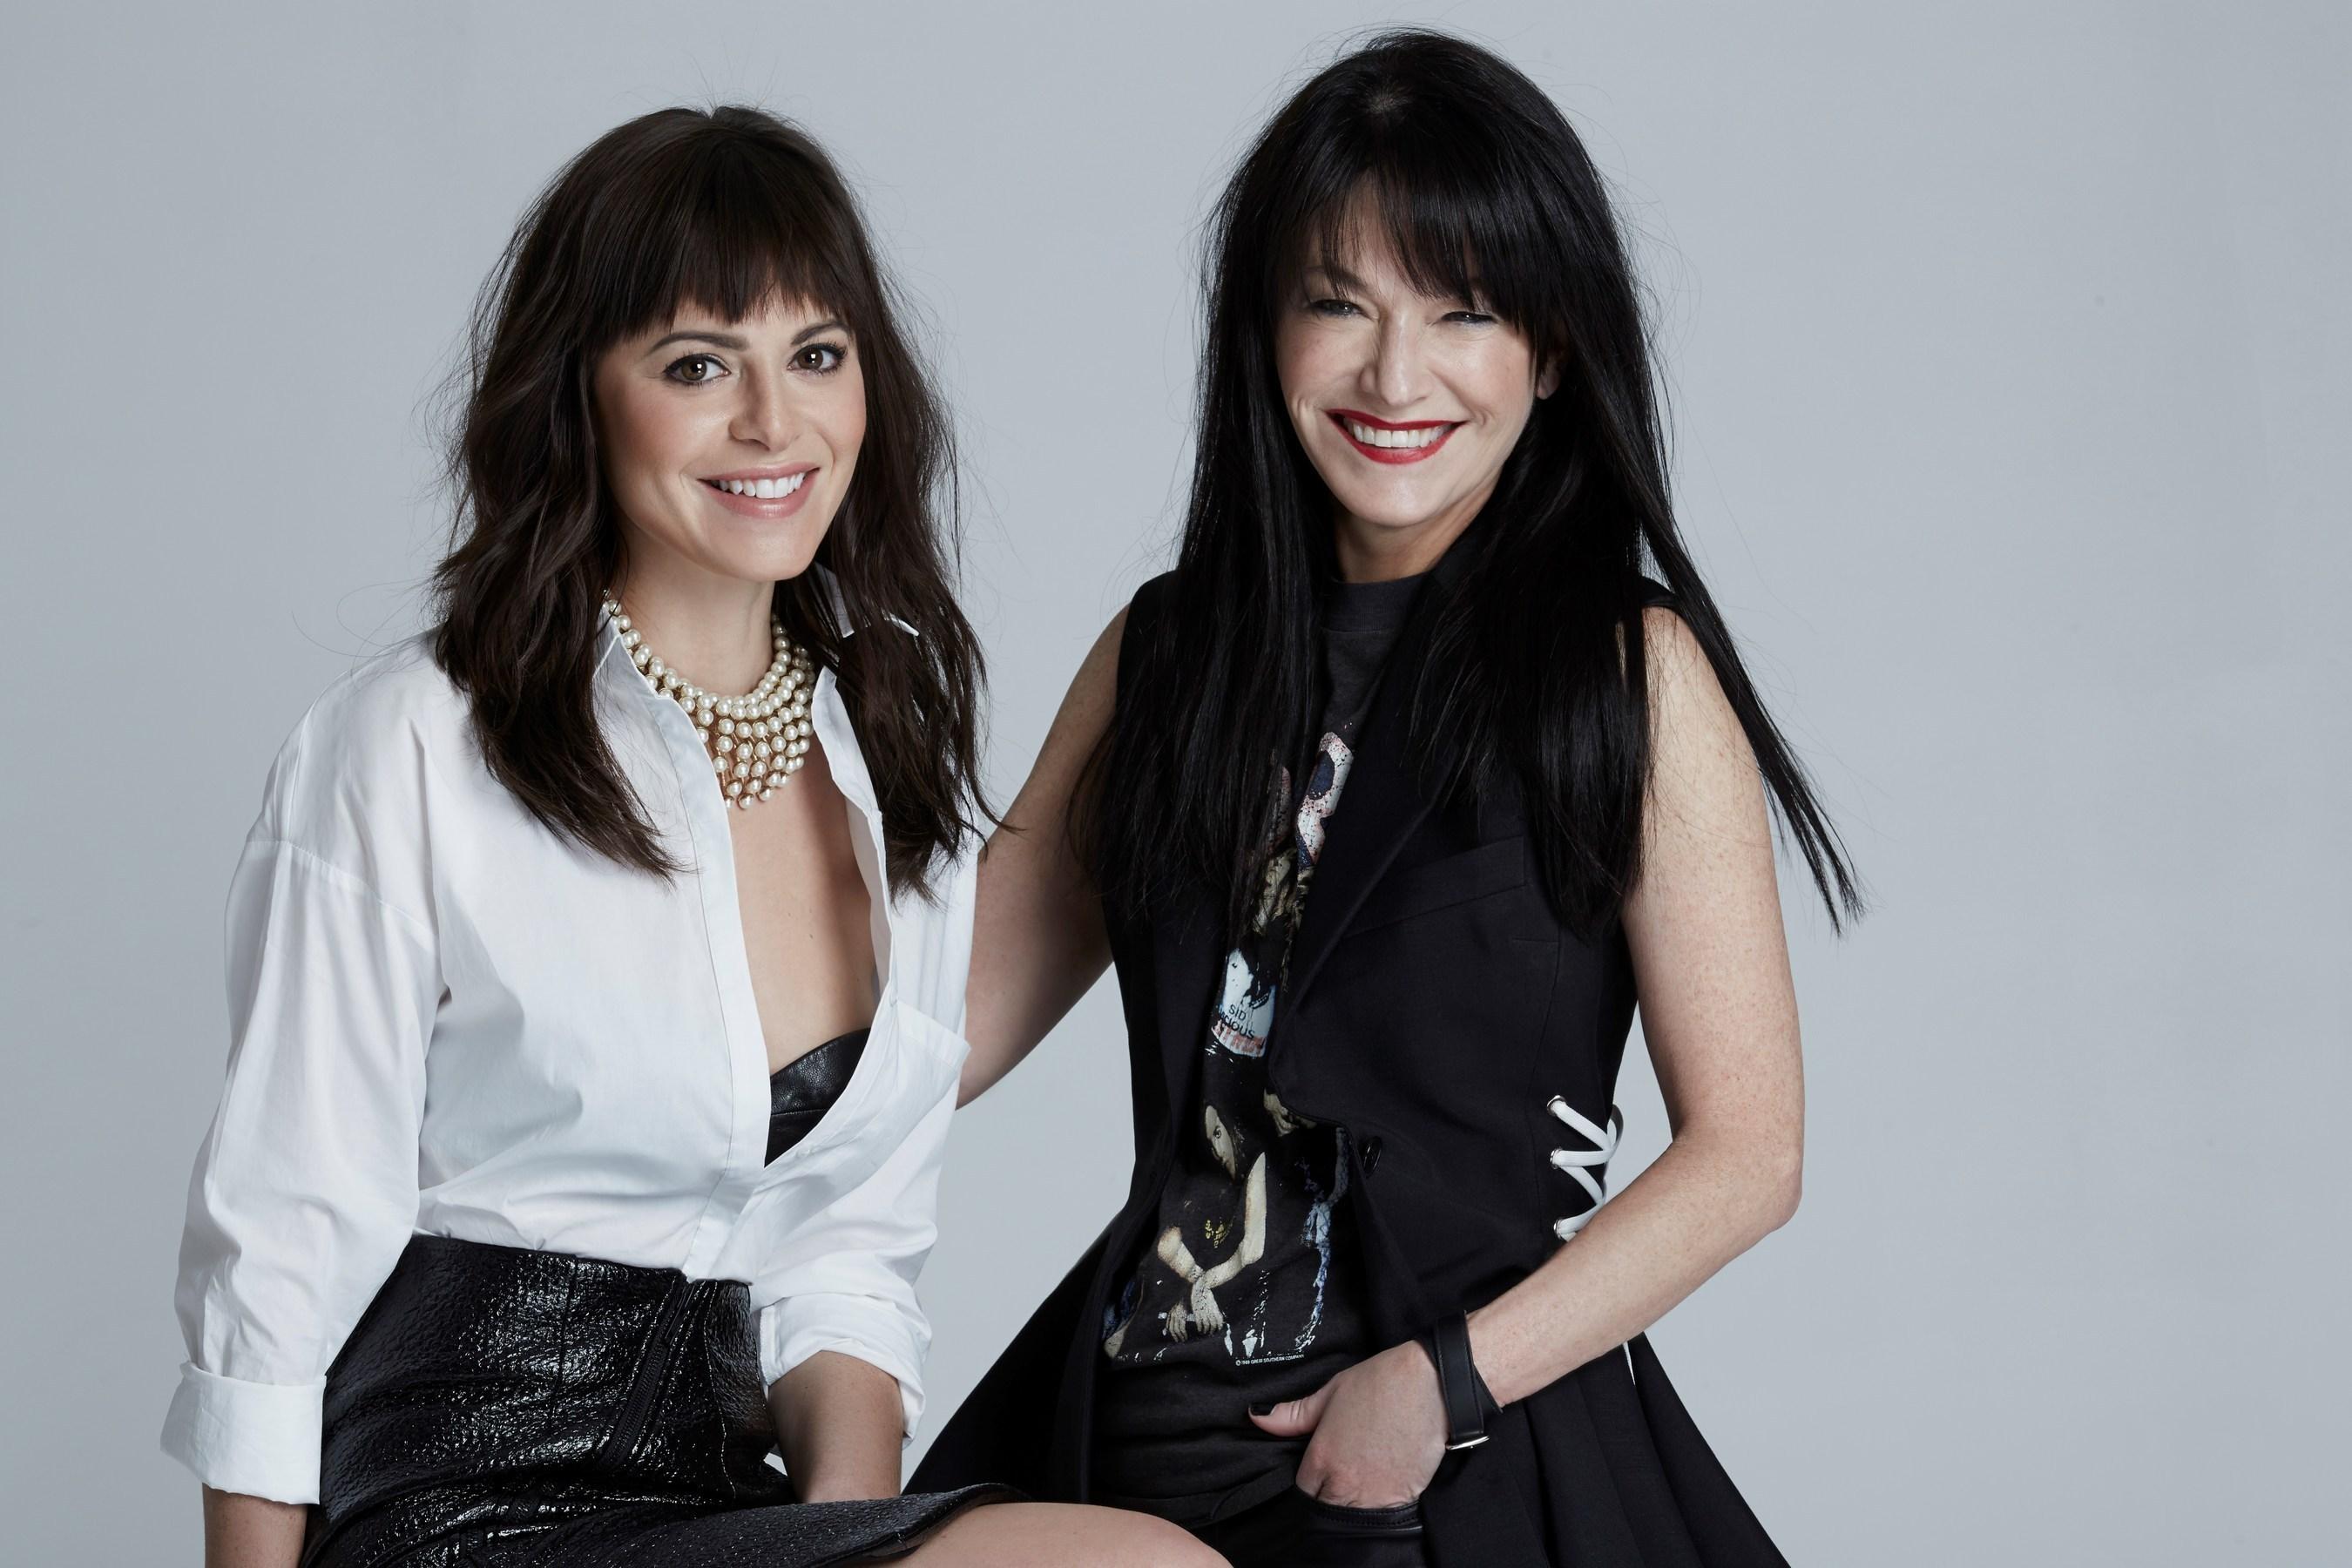 Sophia Amoruso and Sheree Waterson